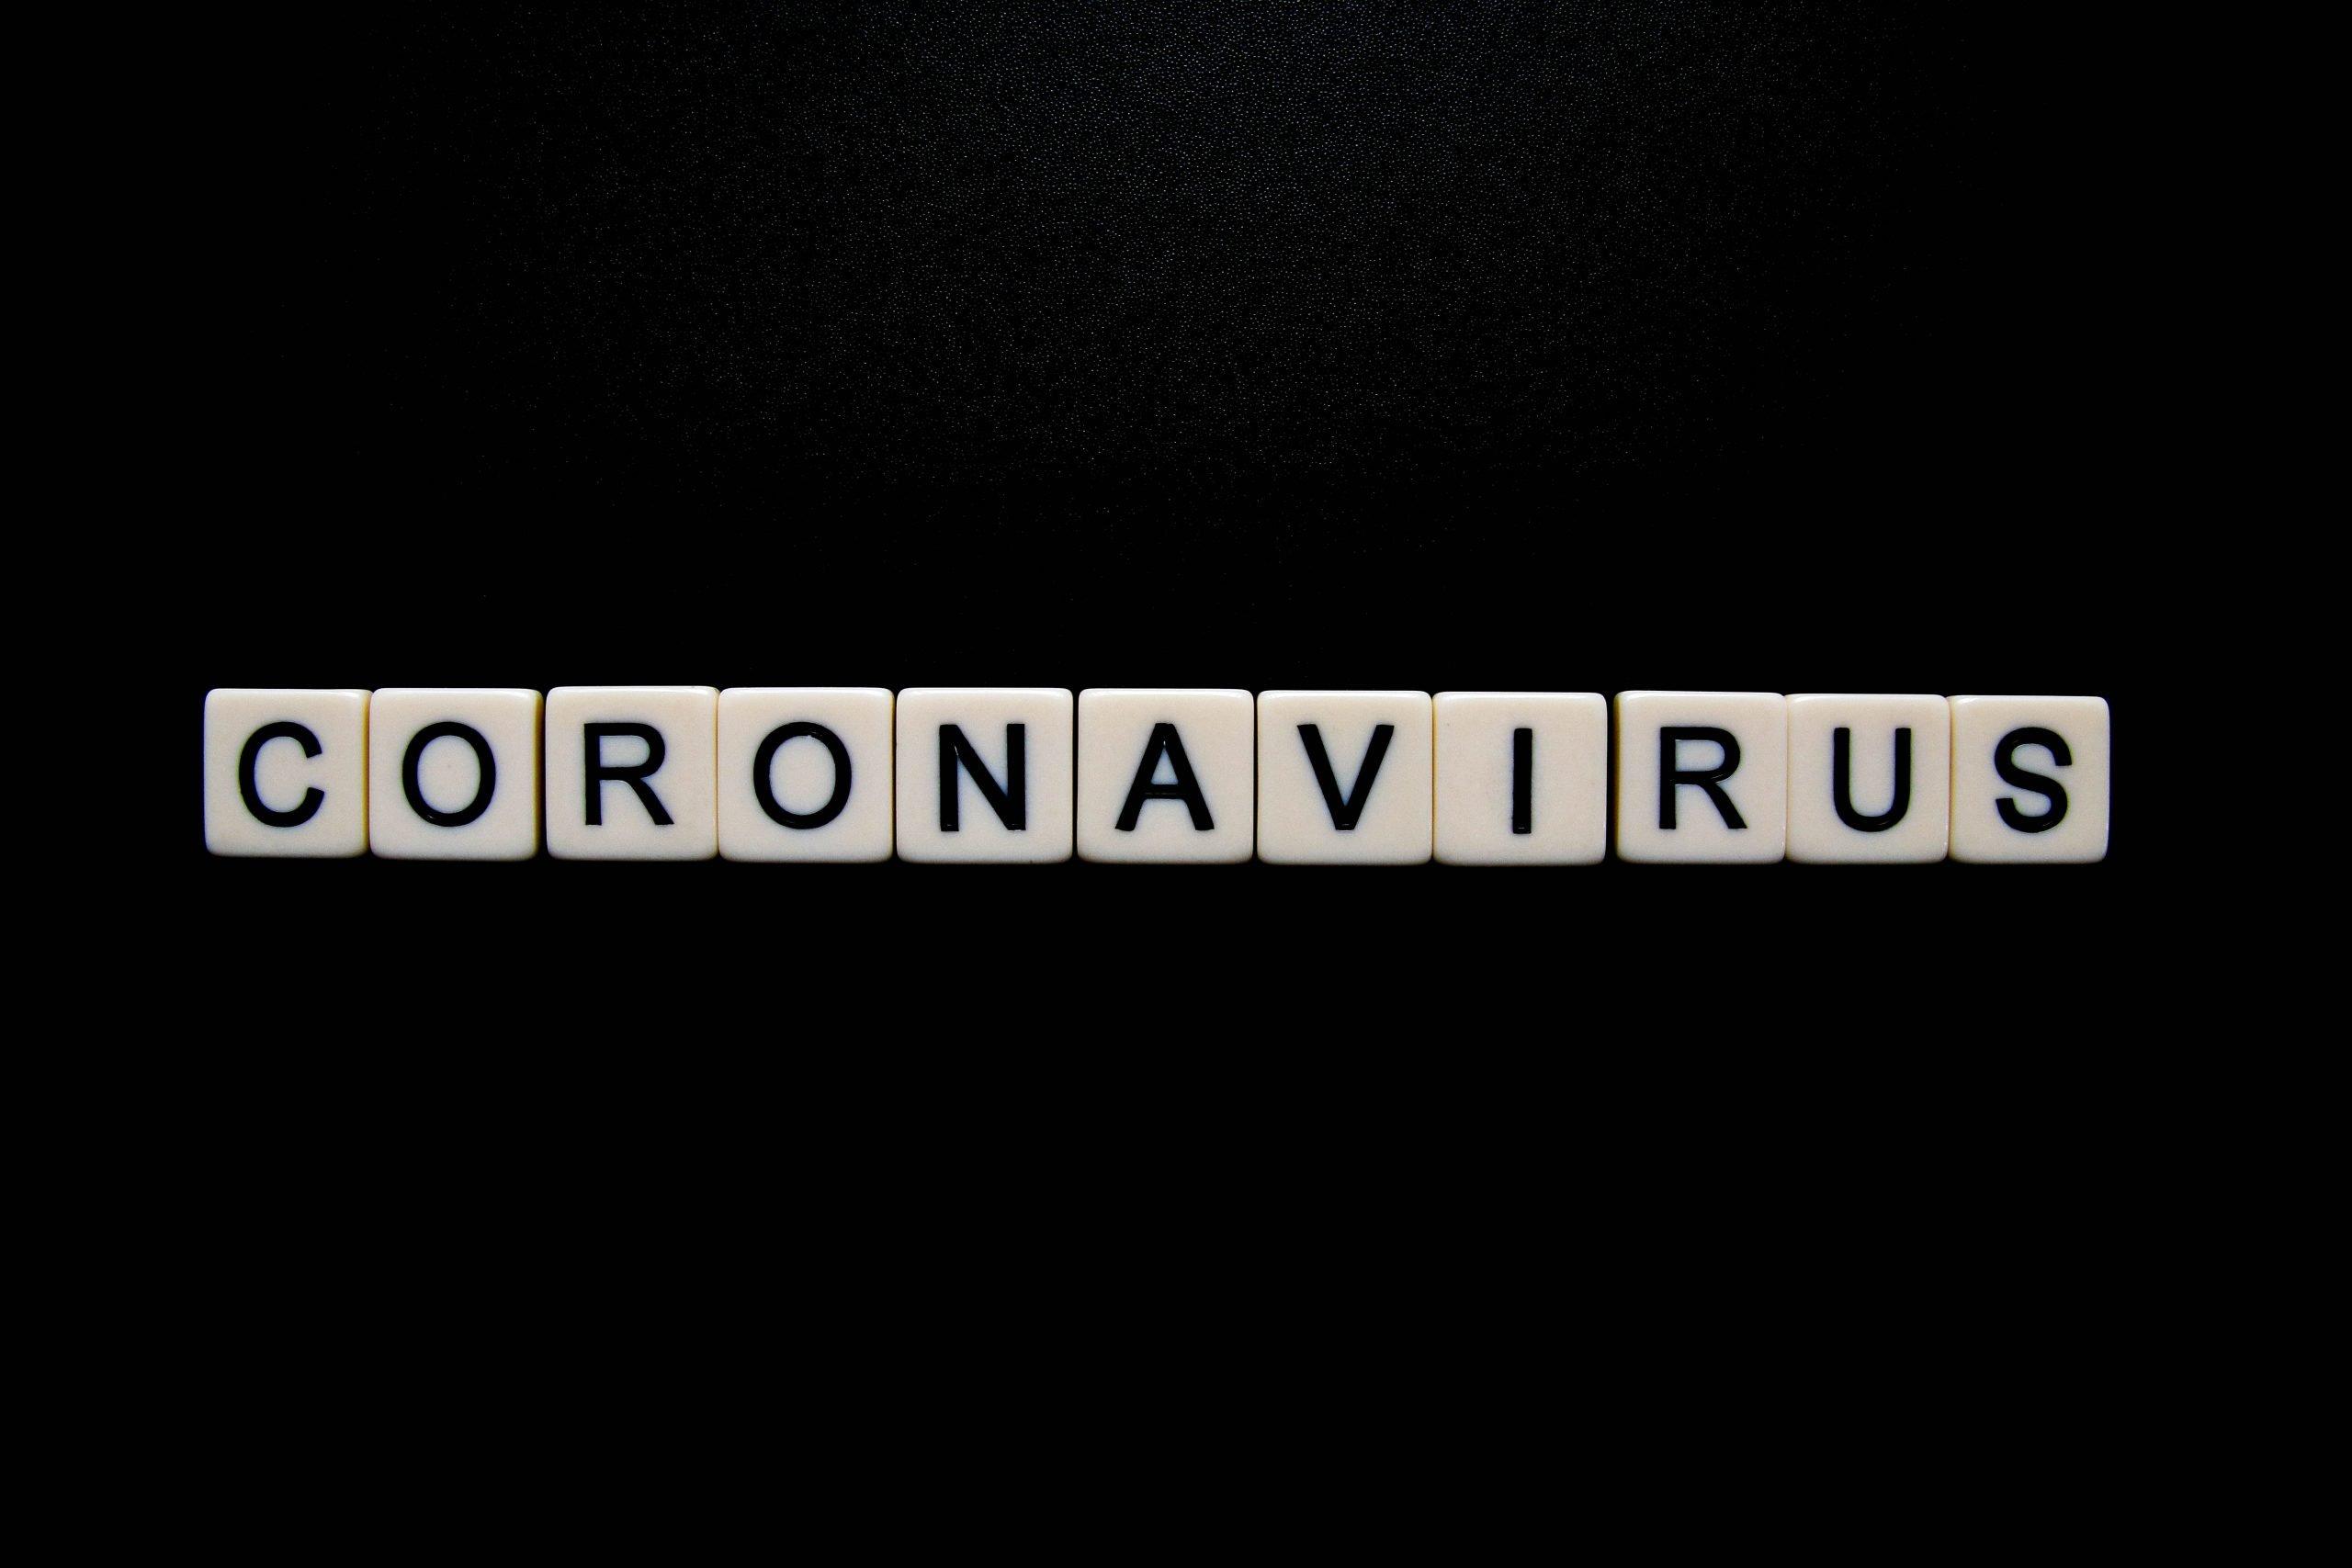 Coronavirus en lettres de Scrabble